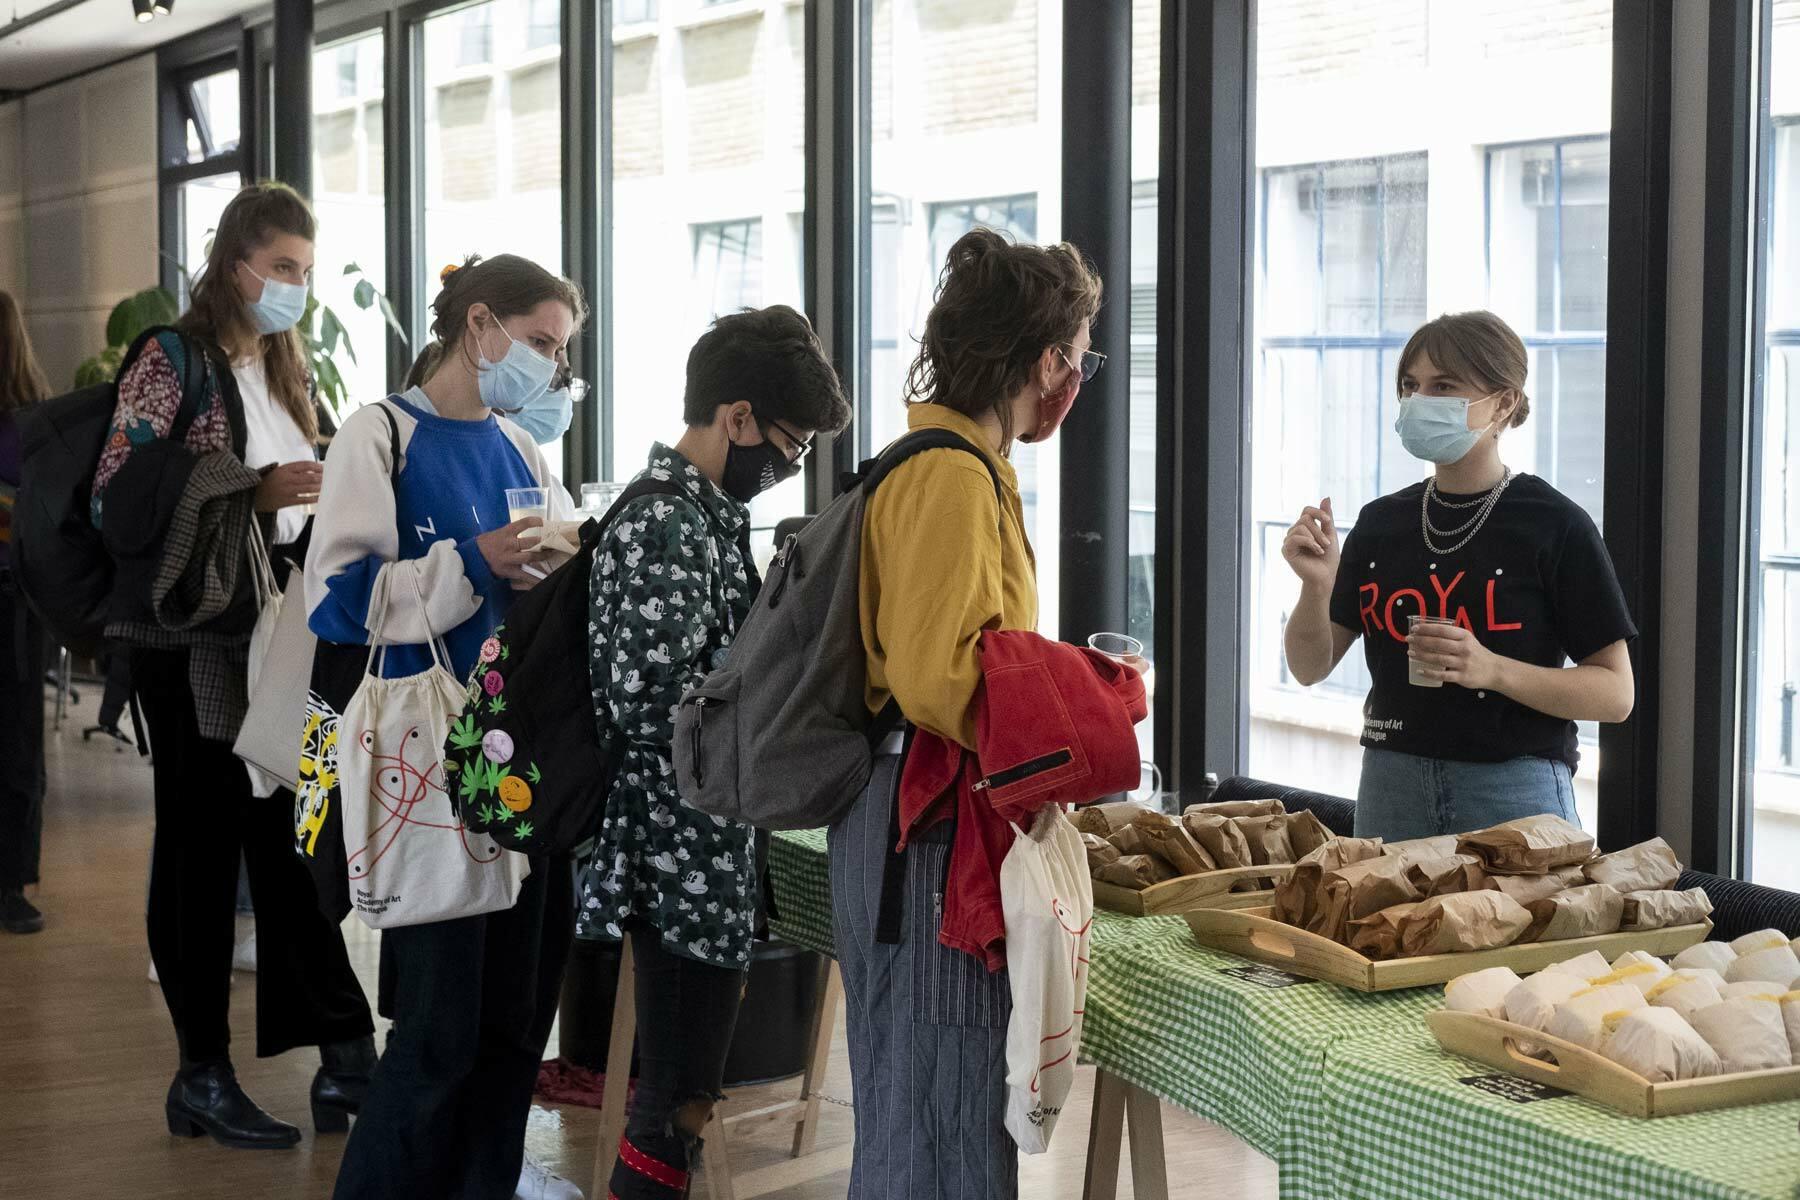 KABK introdagen 2021 - Lunch at the KABK canteen